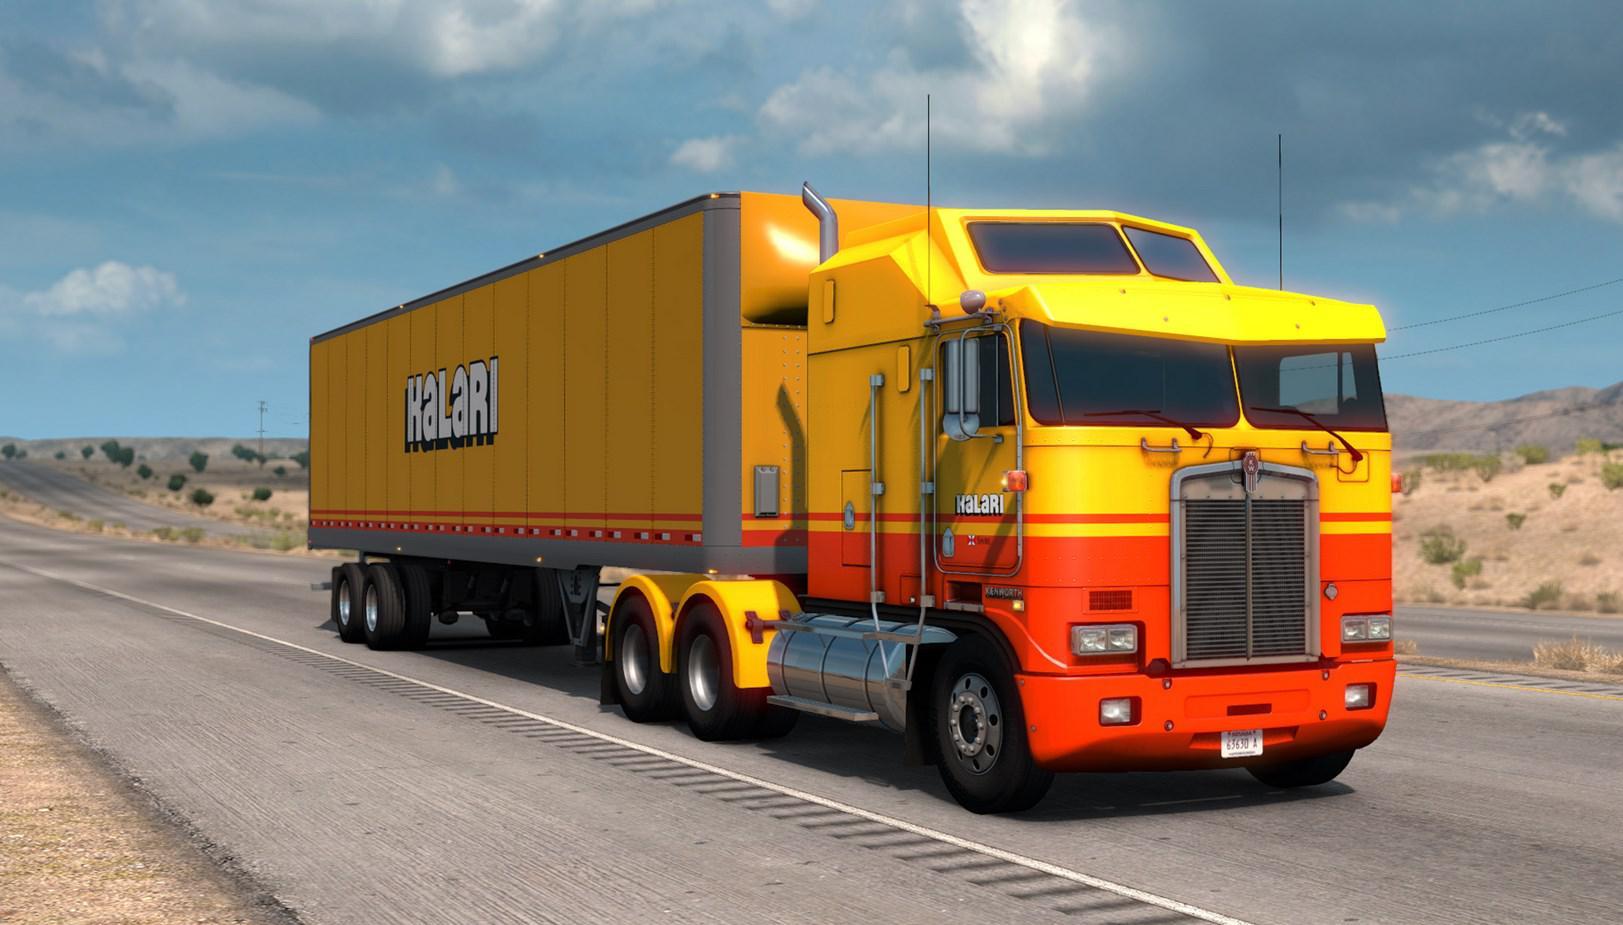 ATS - Kalari Transport Paintjob Pack V1.0 (1.36.x)